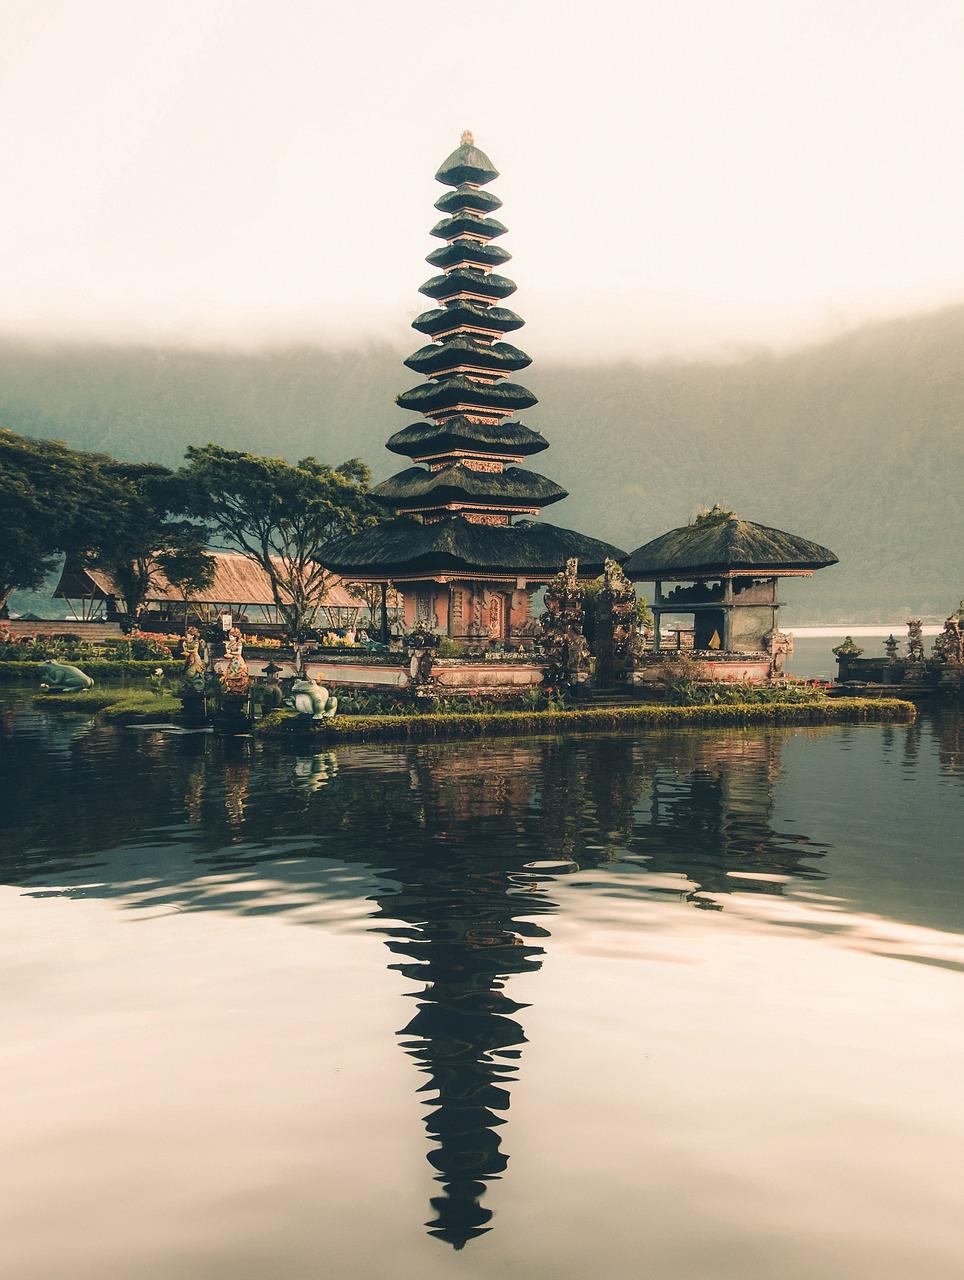 Jungla Indonesia